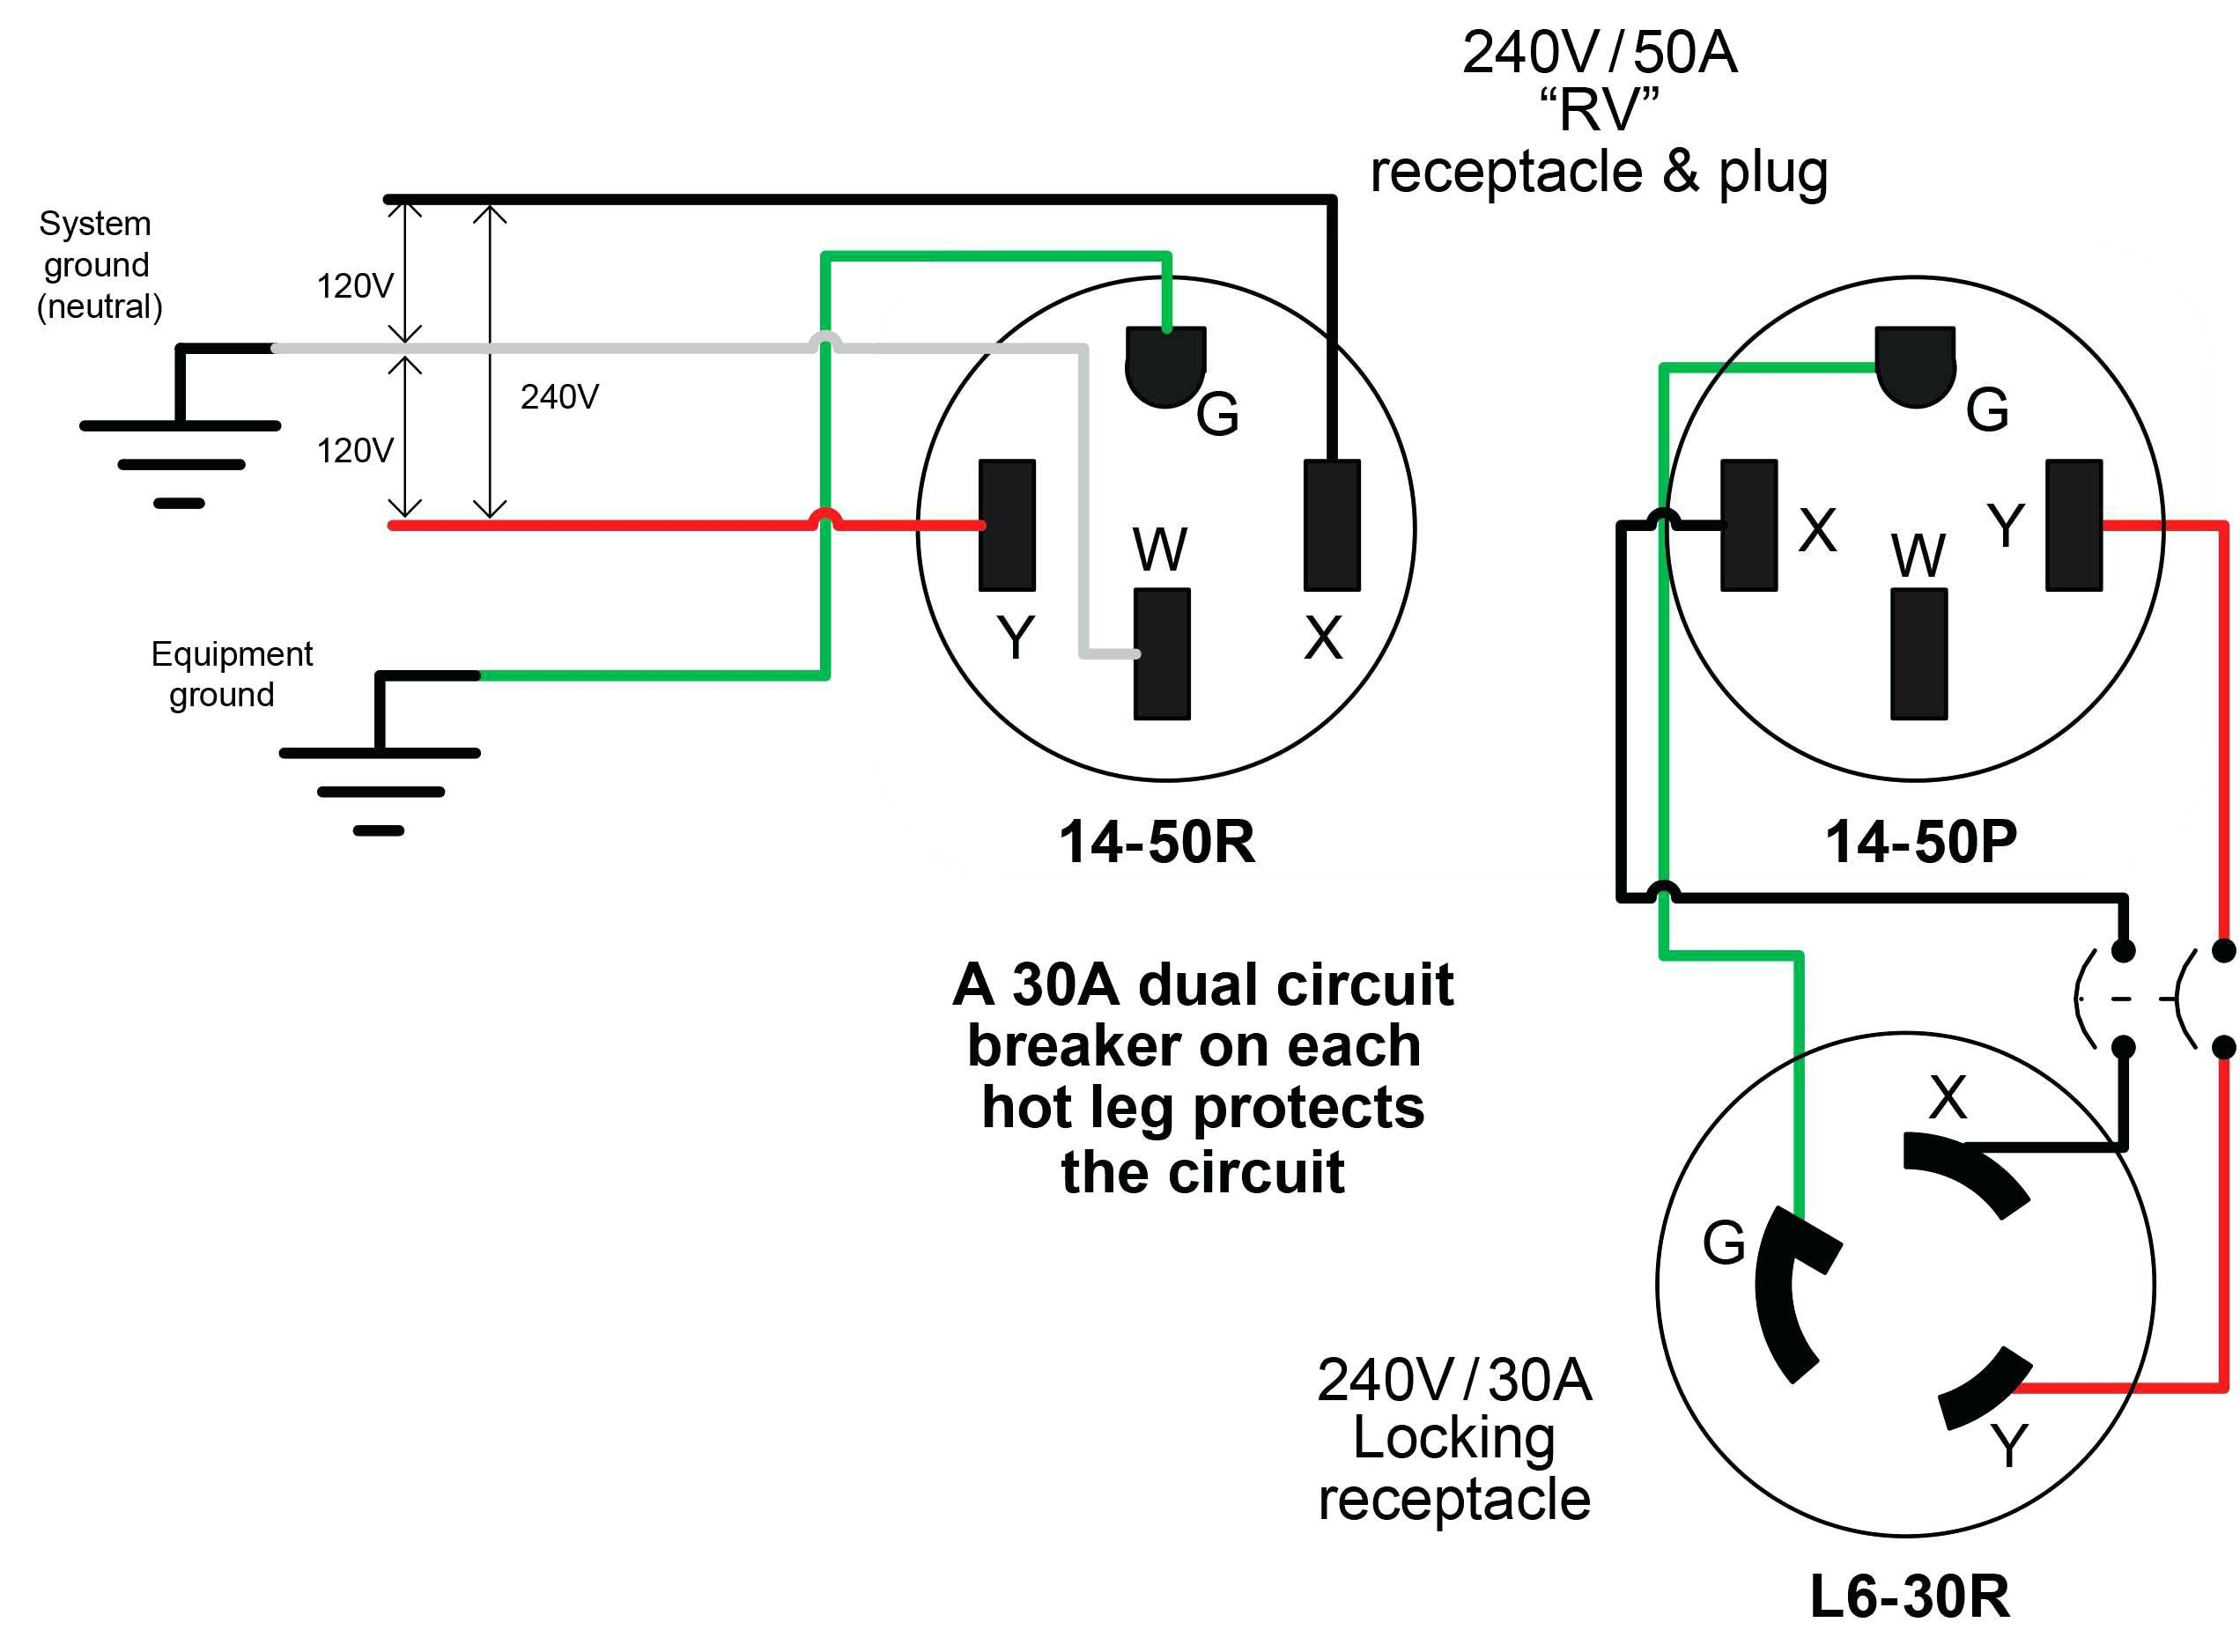 Download DIAGRAM Twist Lock Photocell Wiring Diagram FULL Version HD  Quality Wiring Diagram - INFLATABLESALES.SANSECONDOWEB.ITinflatablesales sansecondoweb it